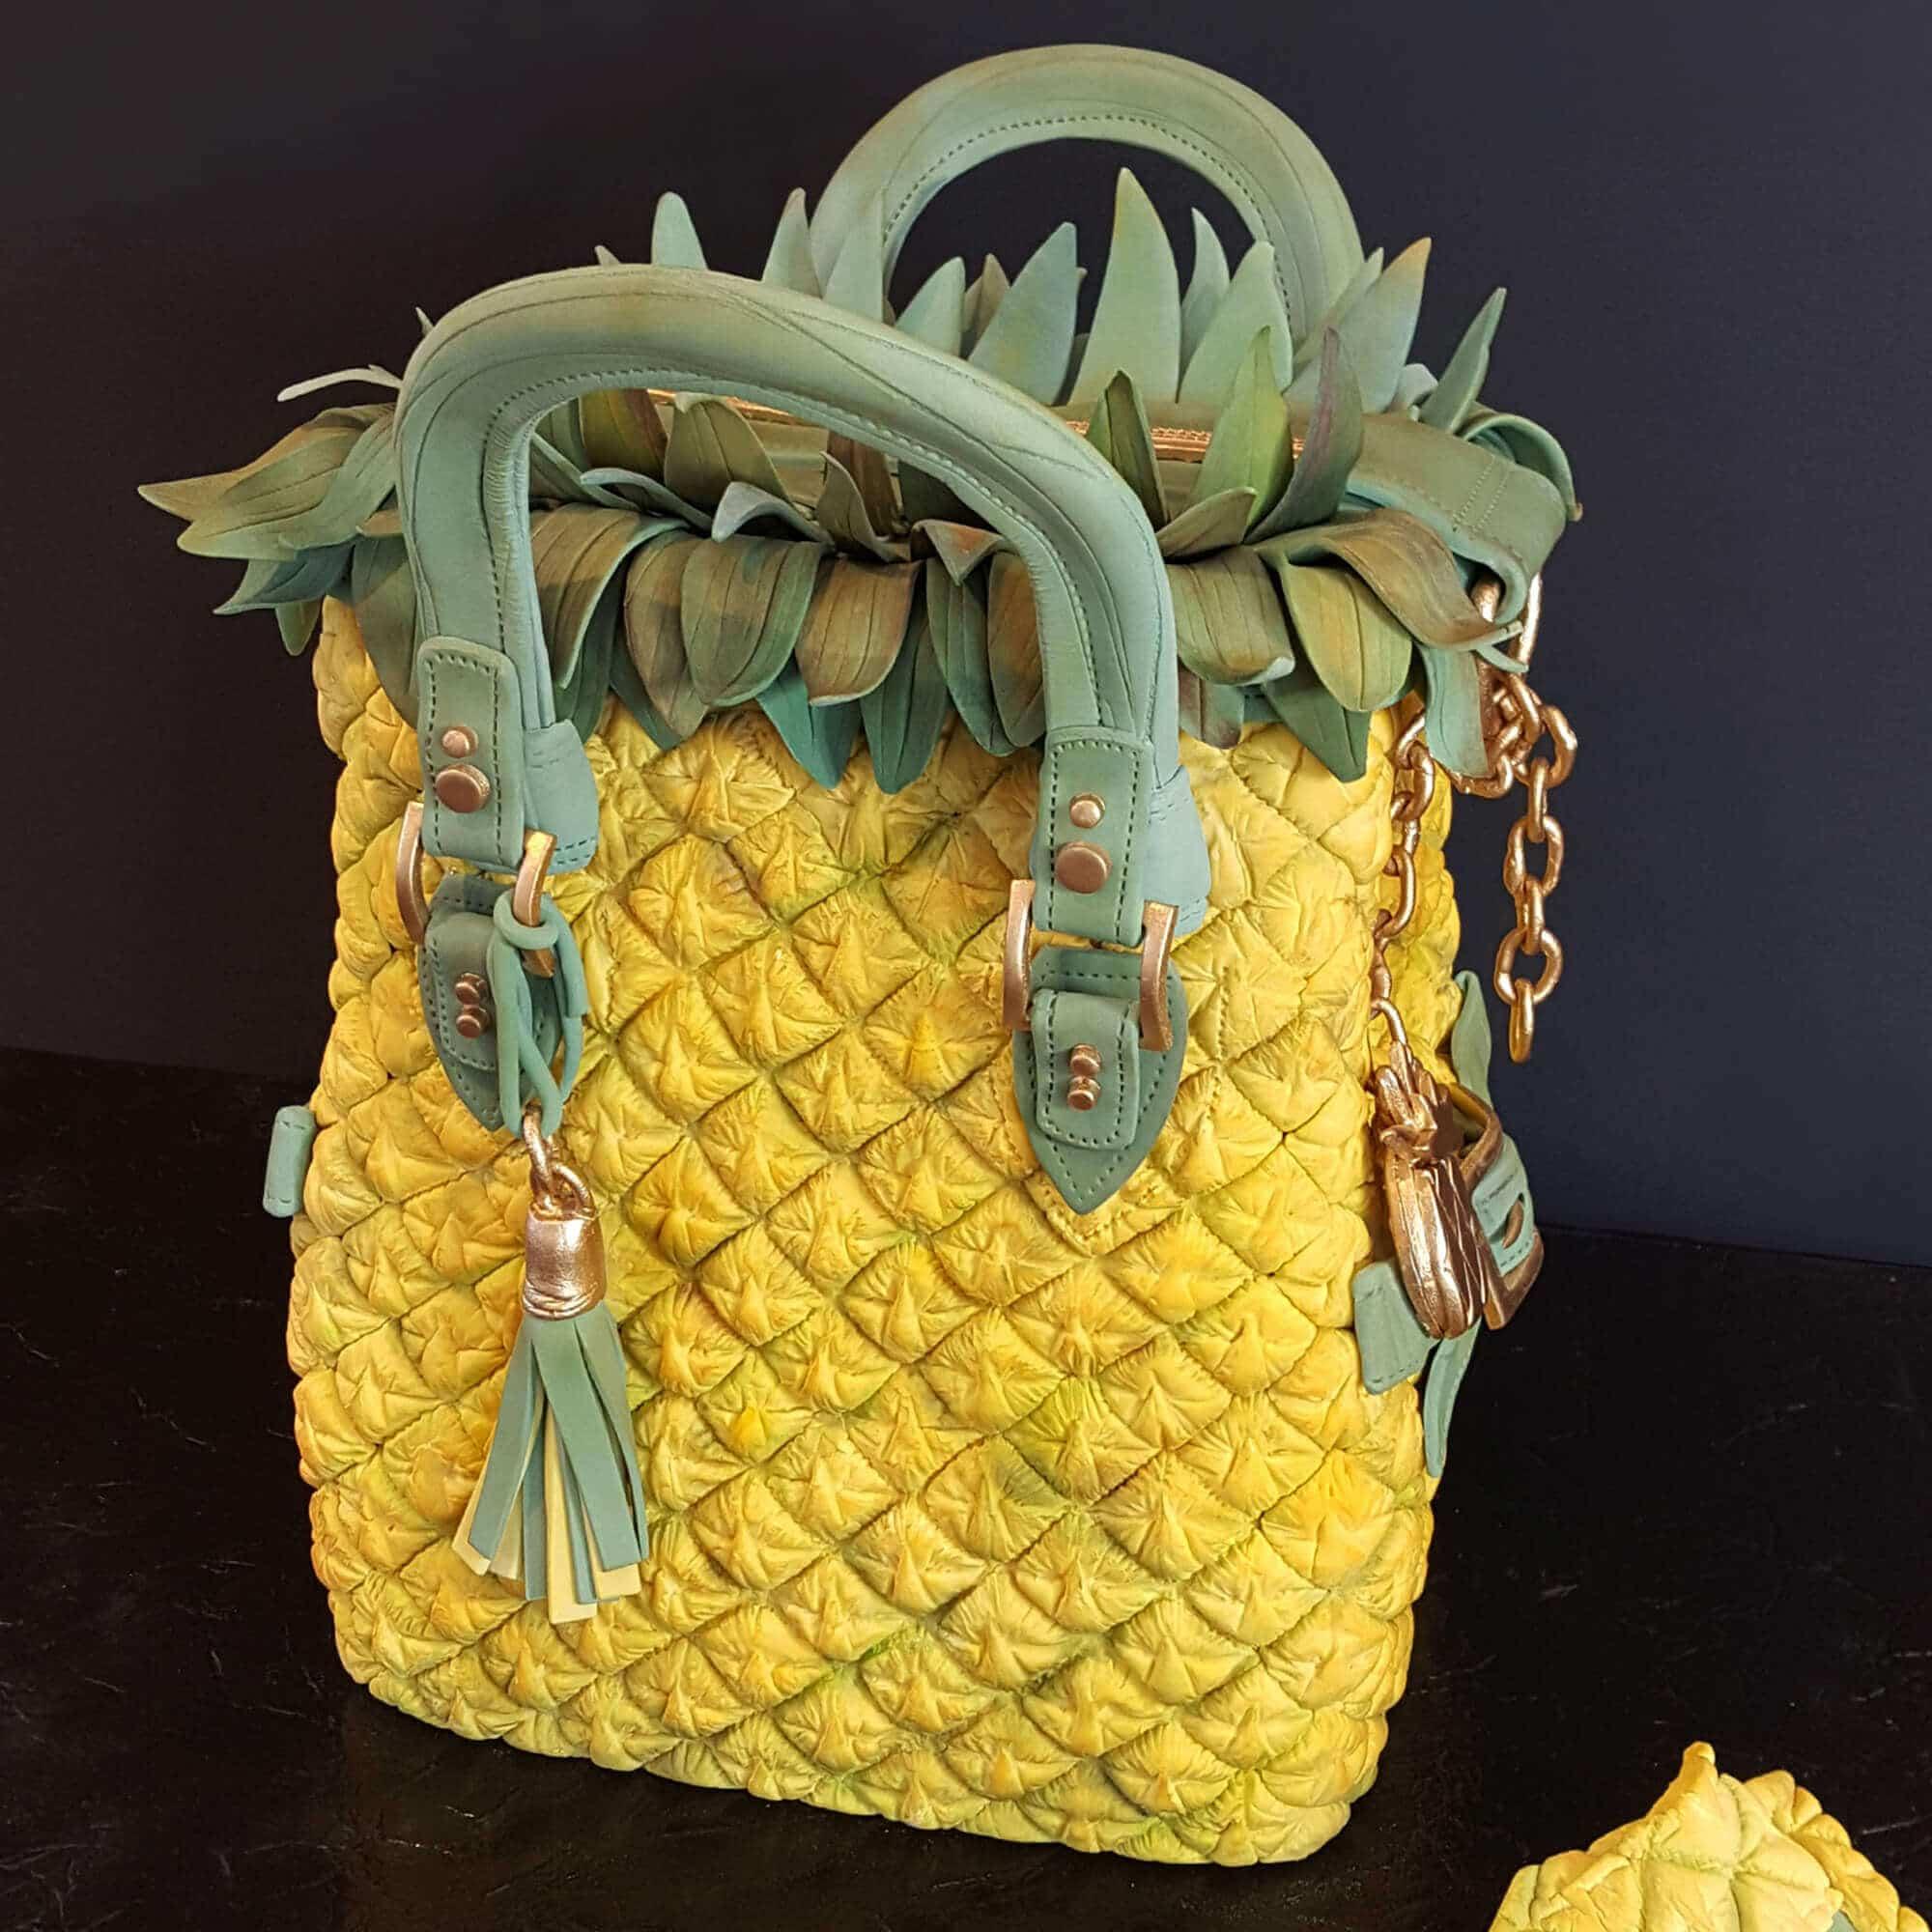 Pineapple handbag cake made by Cake No Mistake